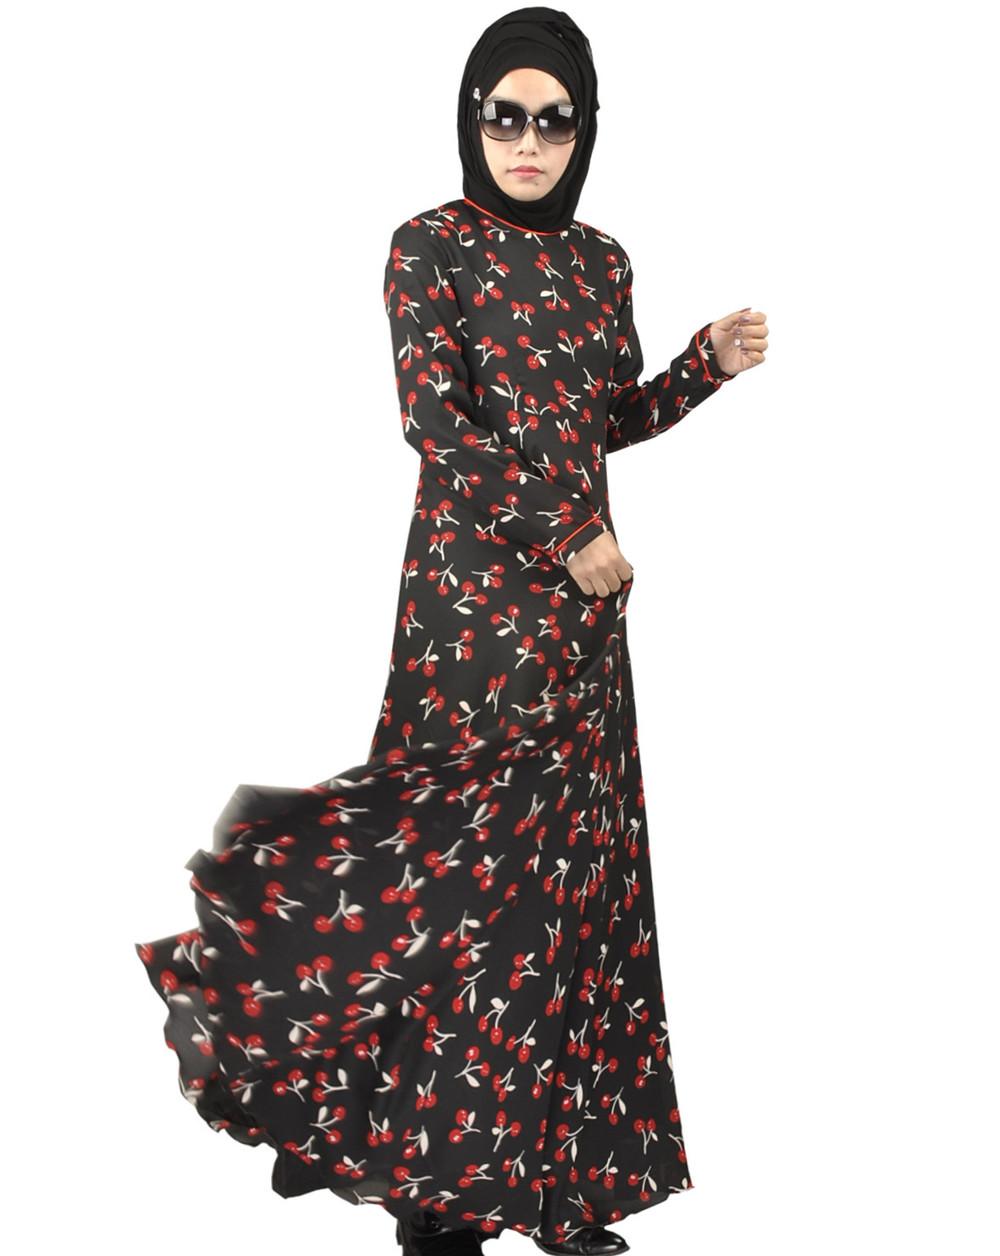 11dceee173df 2016 Moda Abaya Muçulmano Dubai Vestuário Islâmico Para As Mulheres  Muçulmanas Abaya Jilbab Djellaba Musulmane Vestido Estampado Floral rendas  abaya